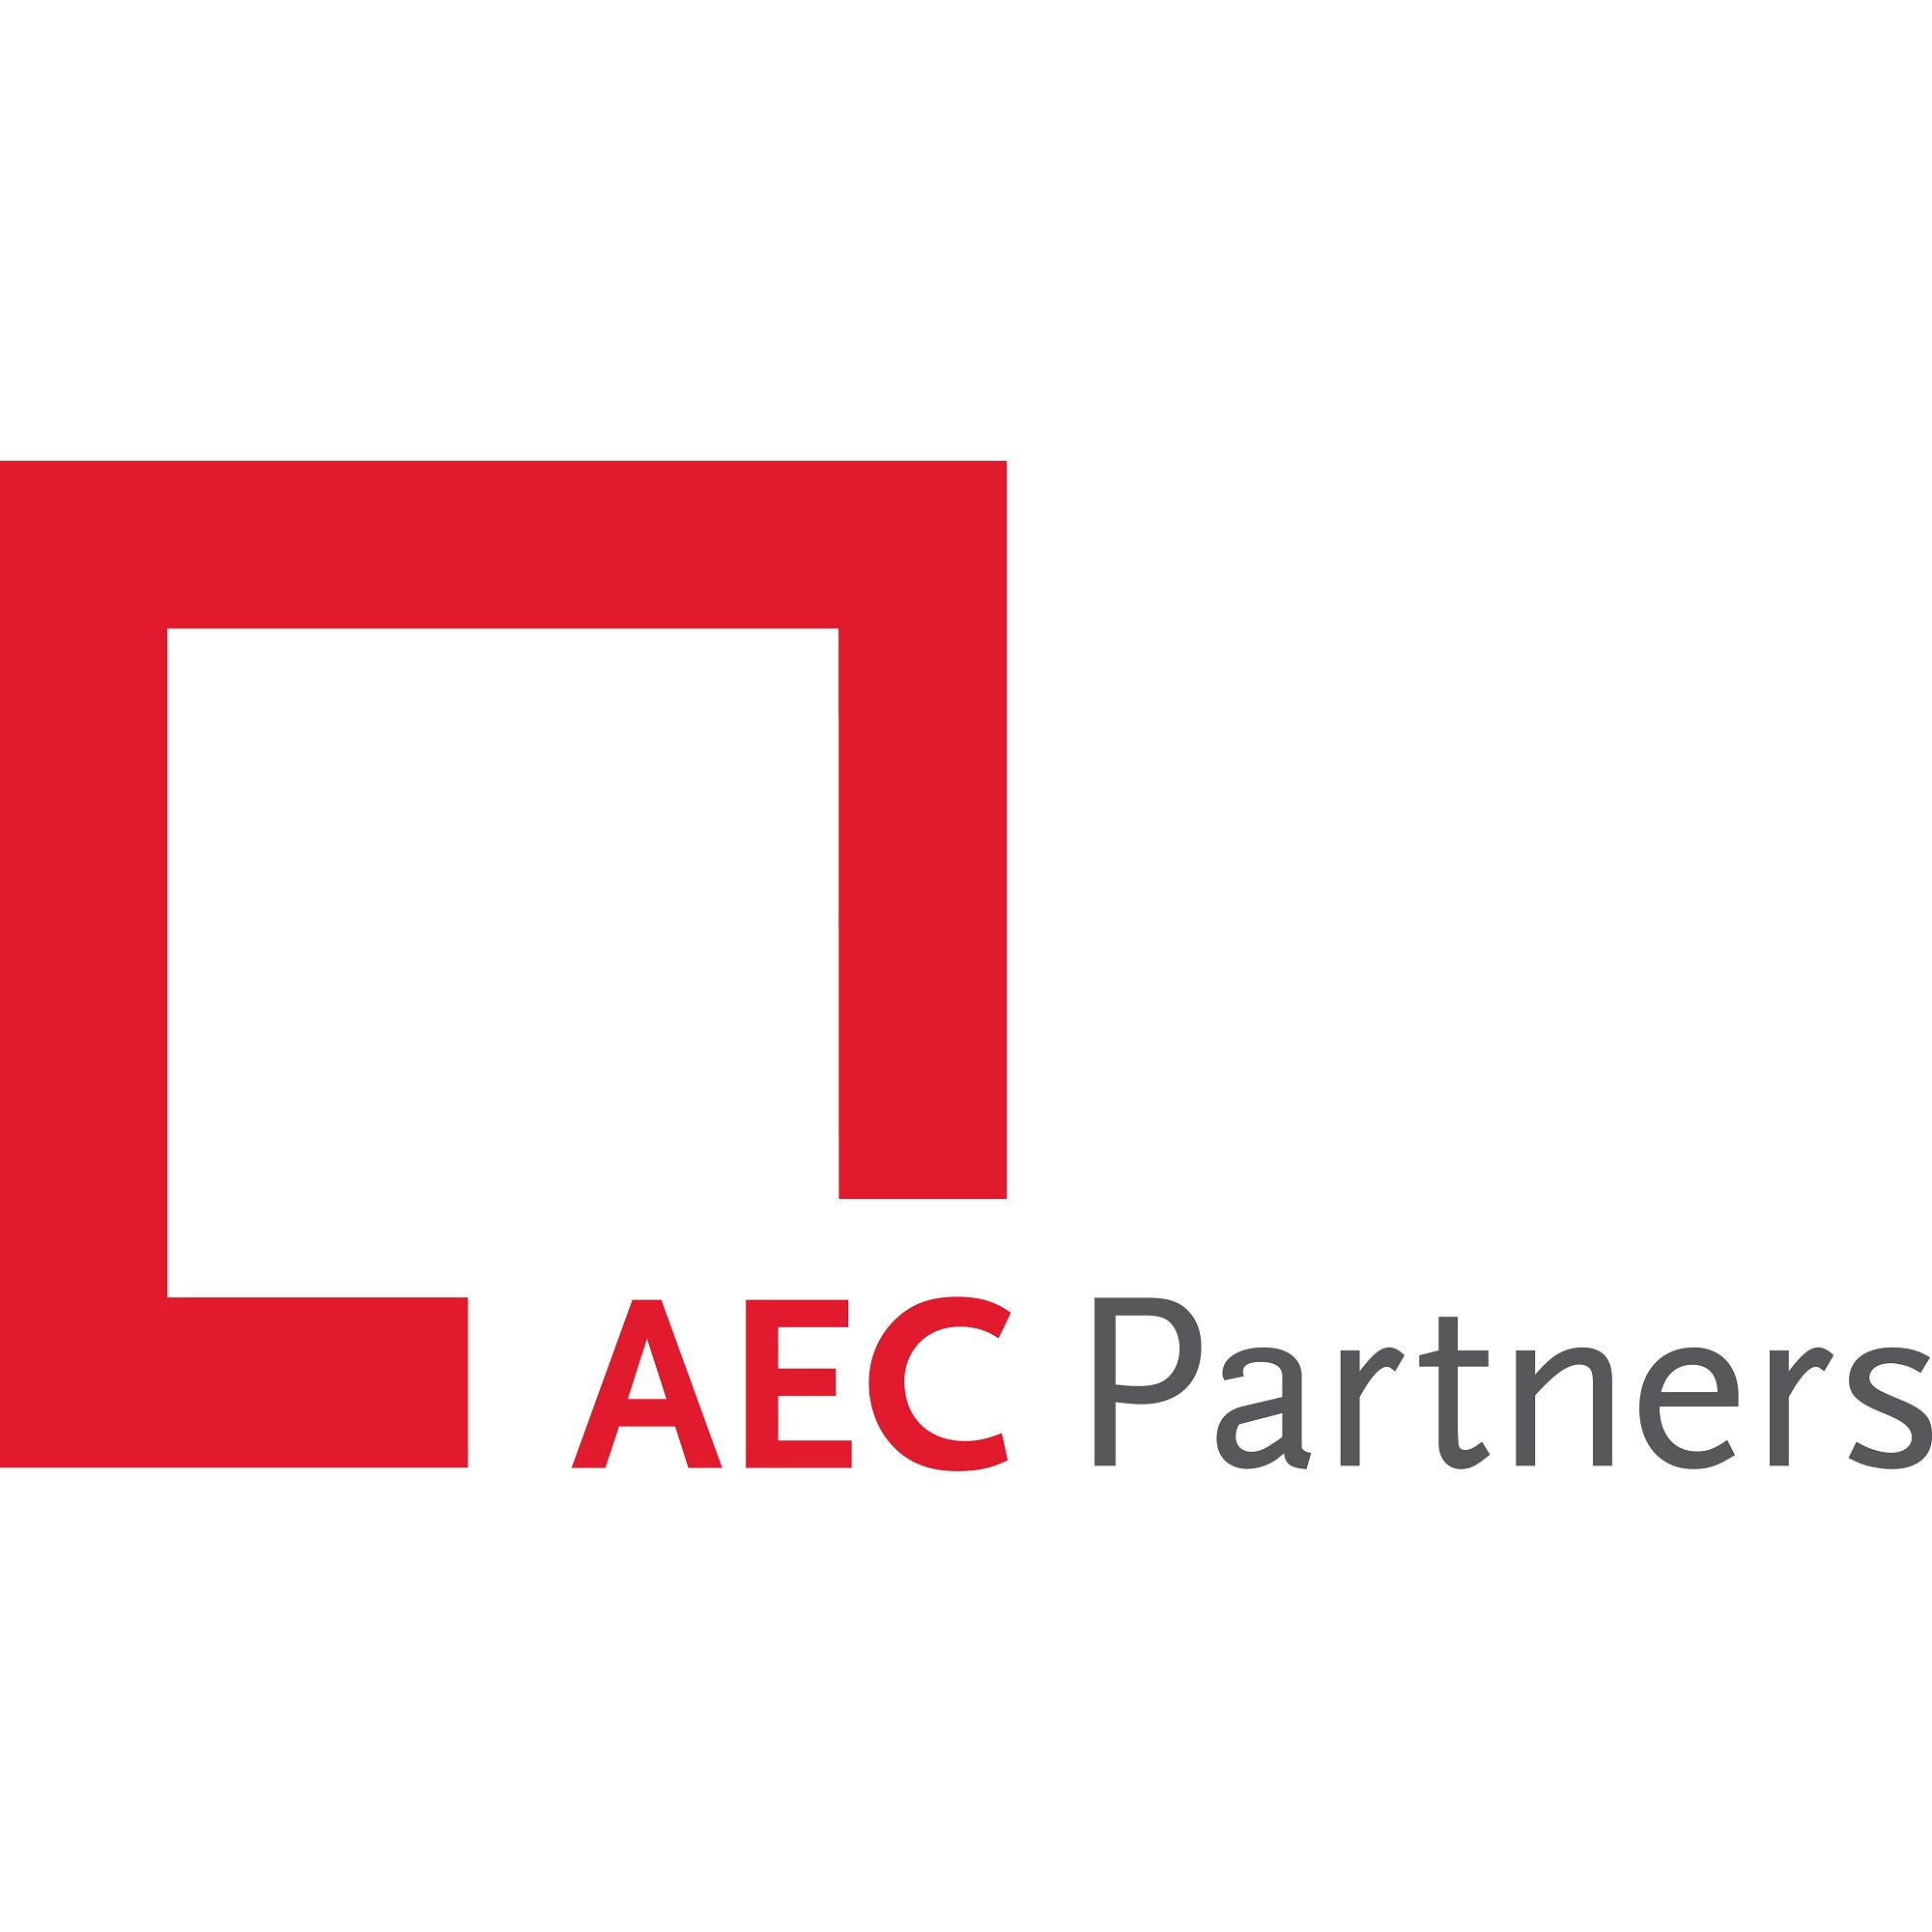 the AEC Partners logo.